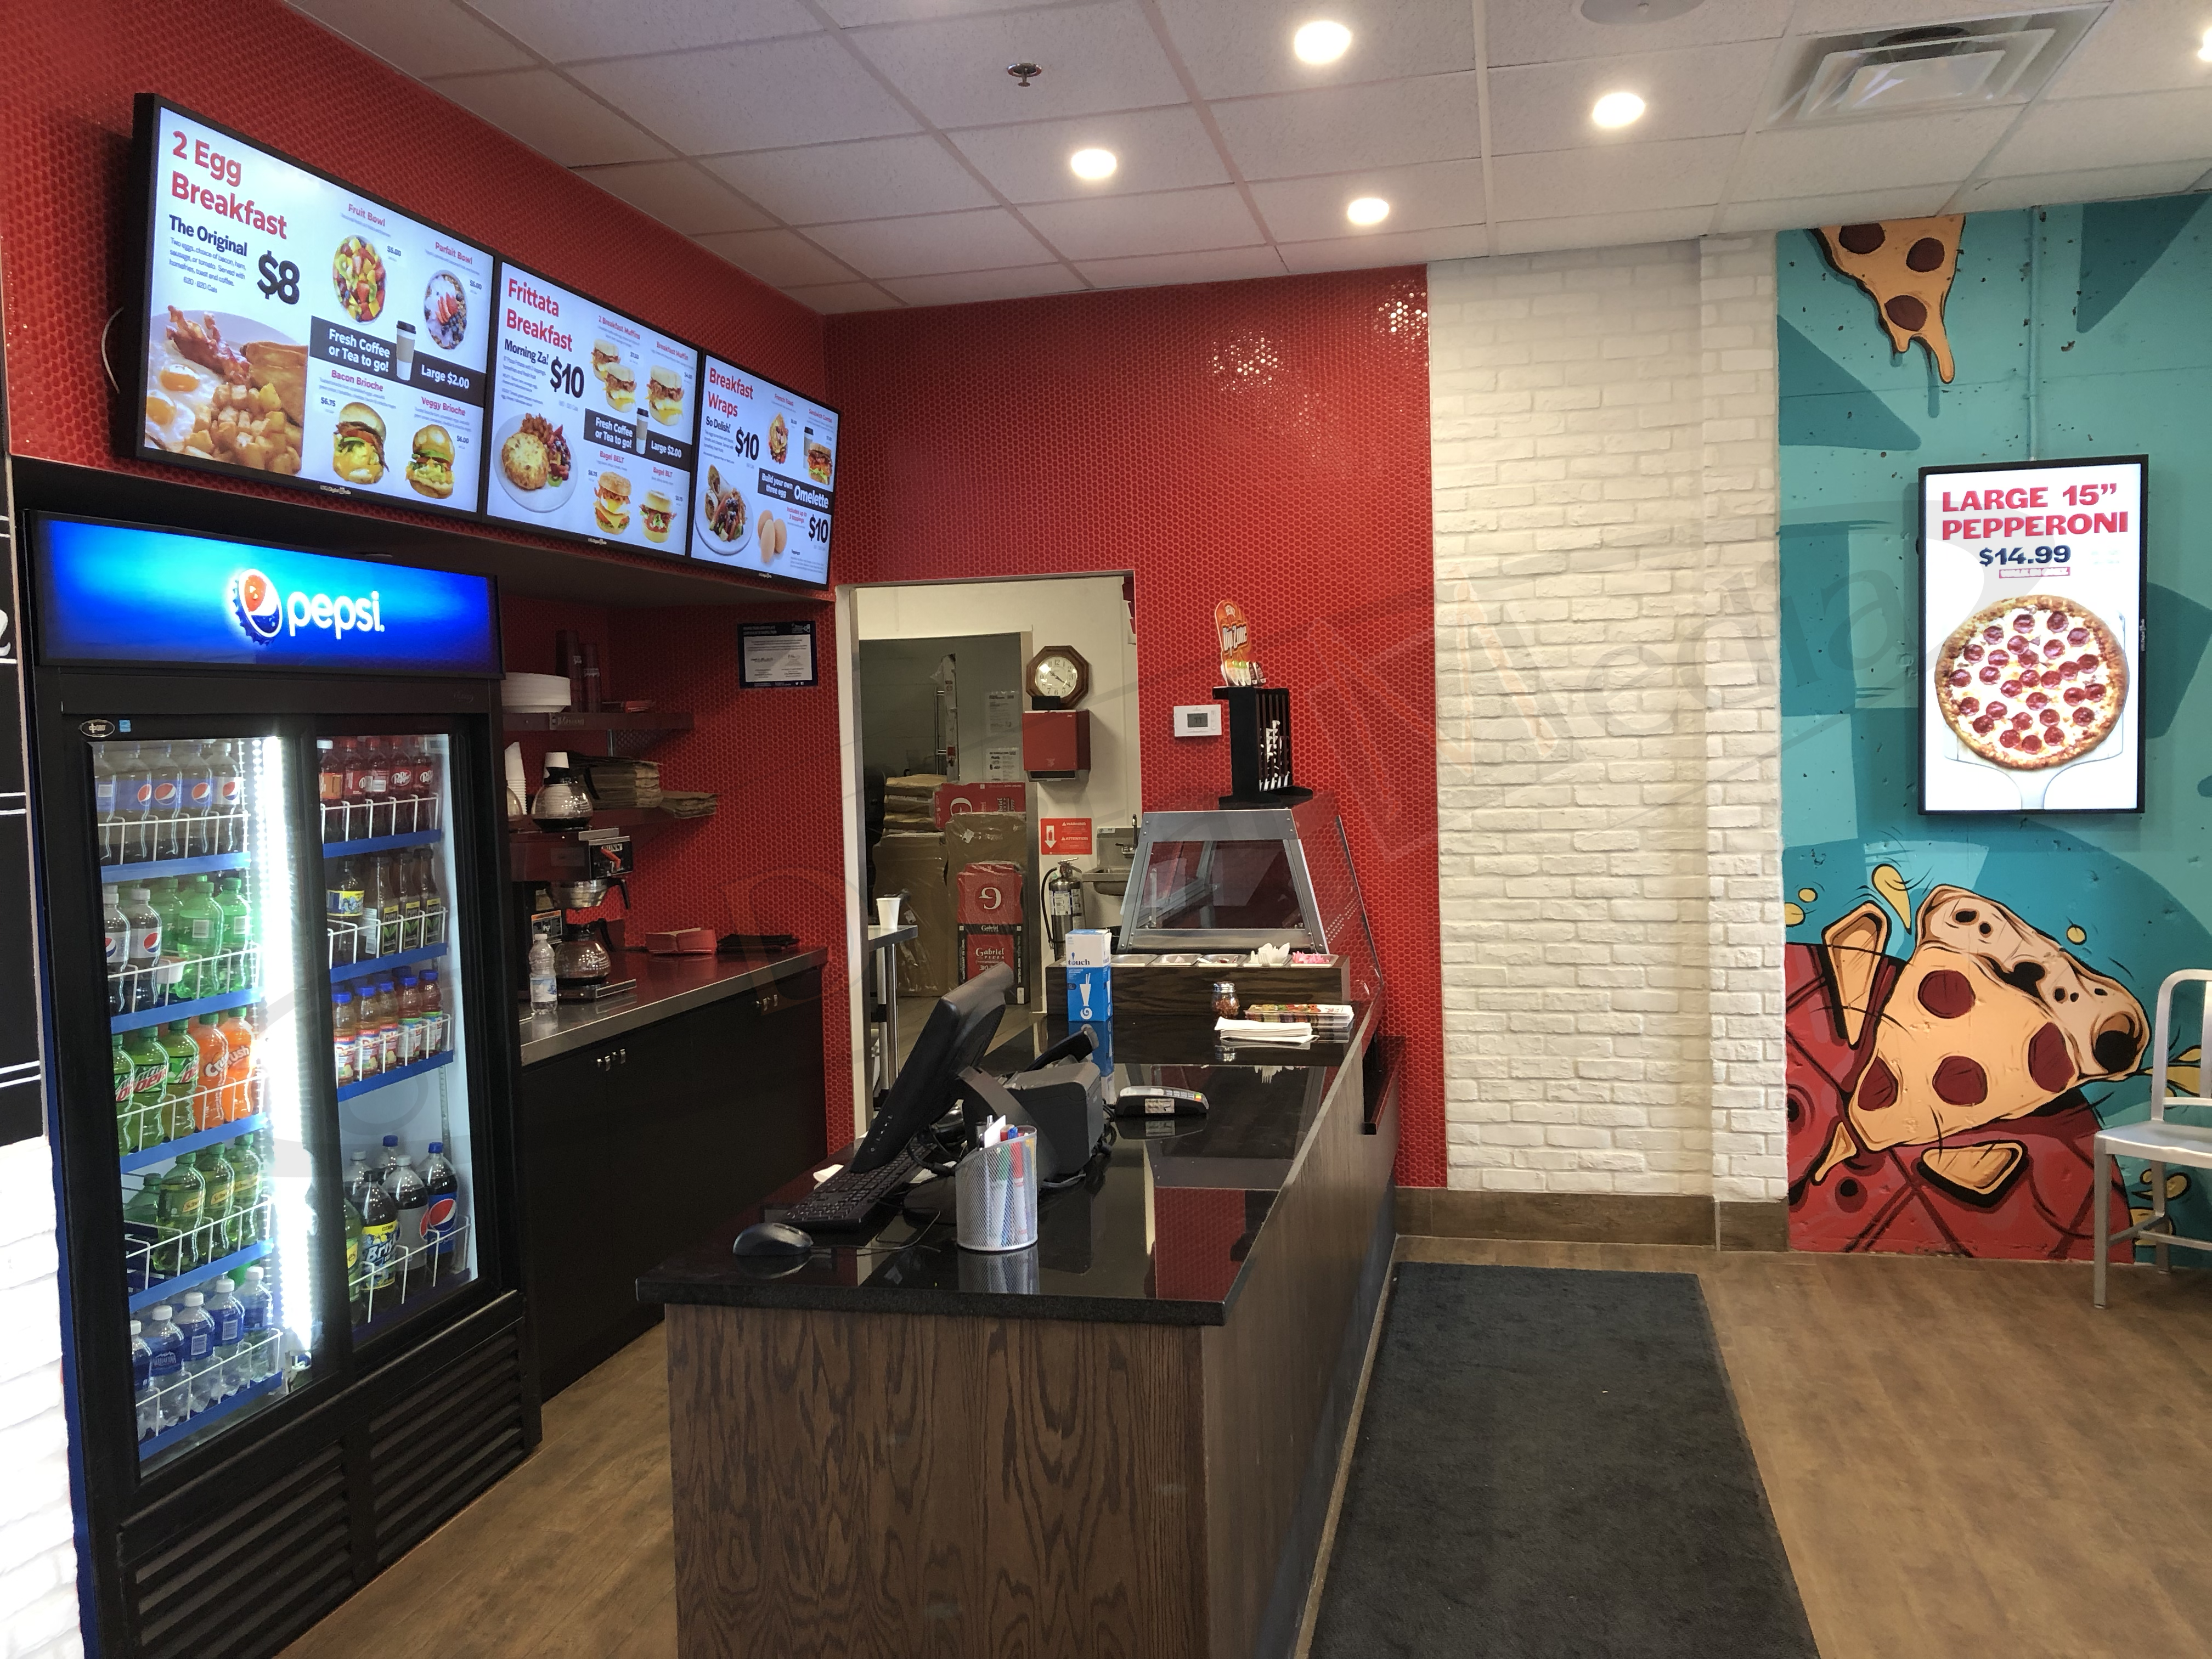 Gabriel Pizza Franchise – Wall Mounted LCD Screen